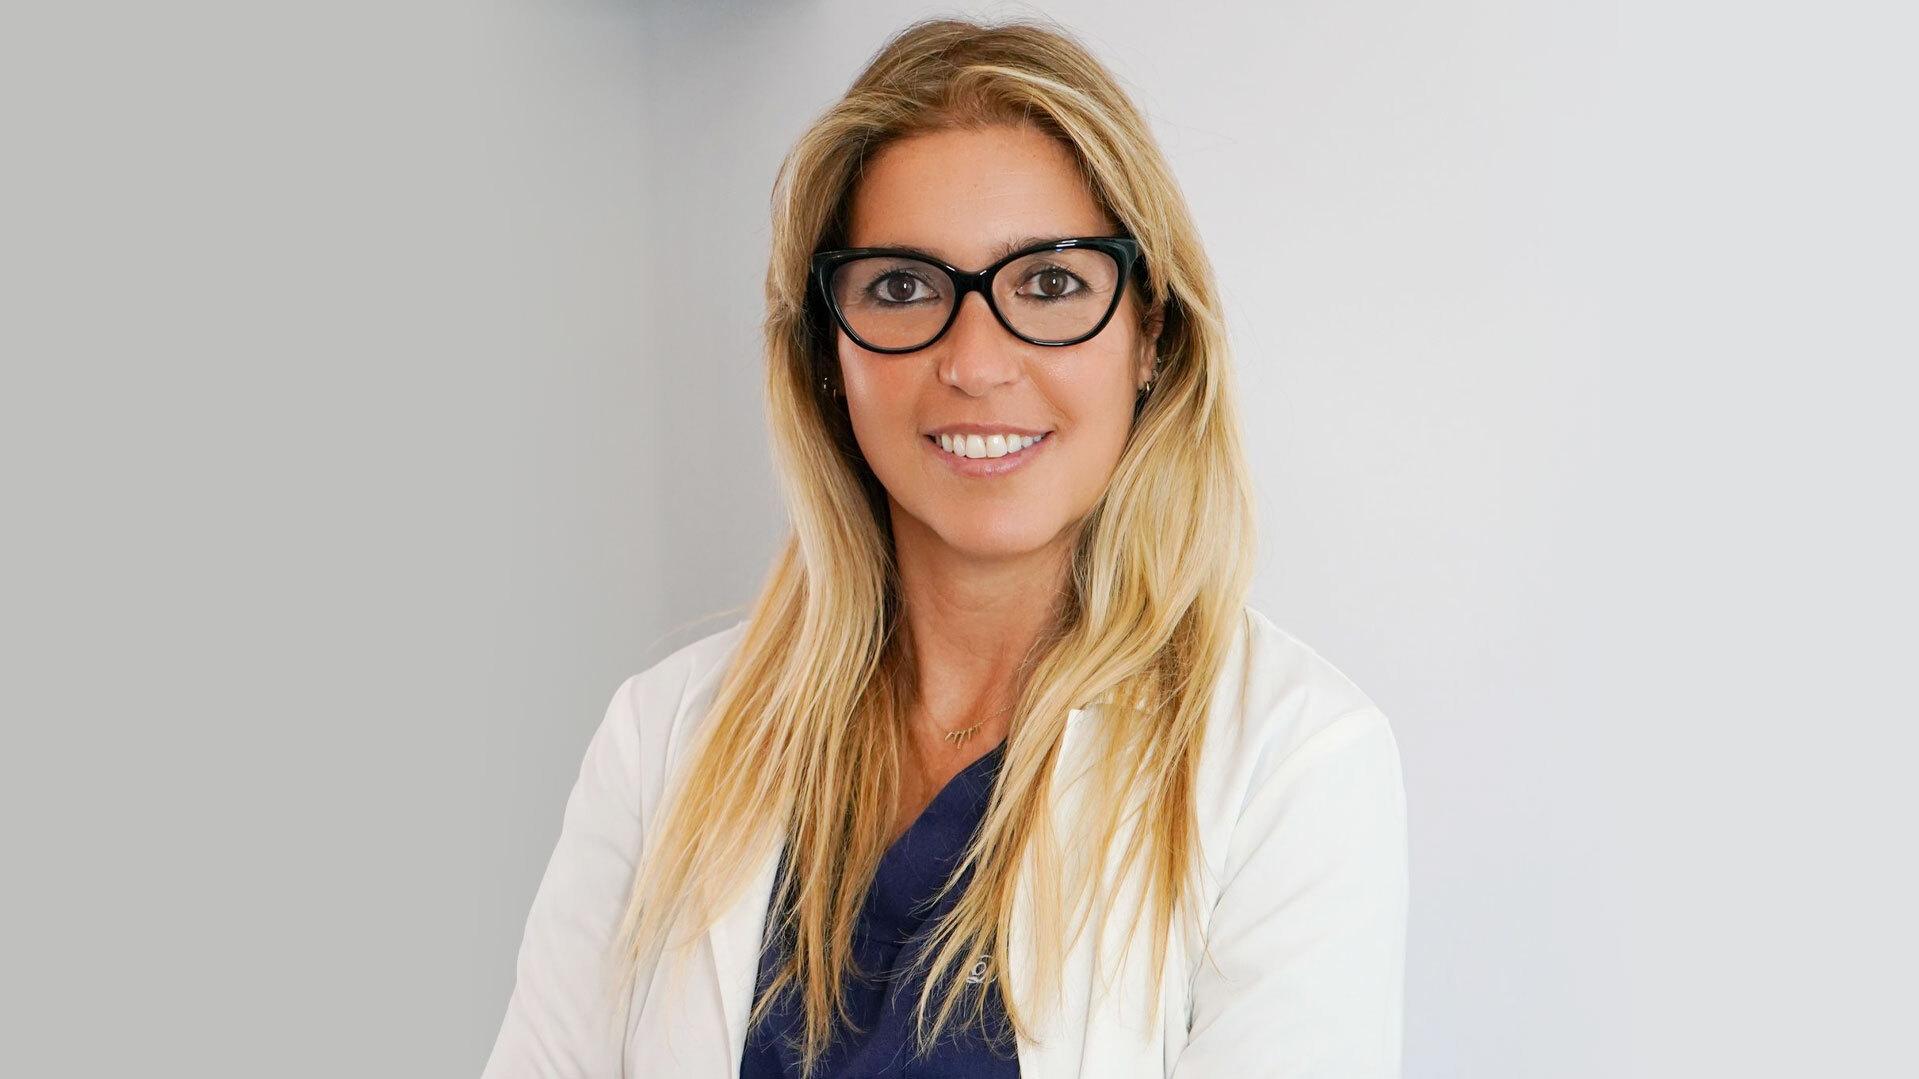 Laura Sierra Piezosurgery